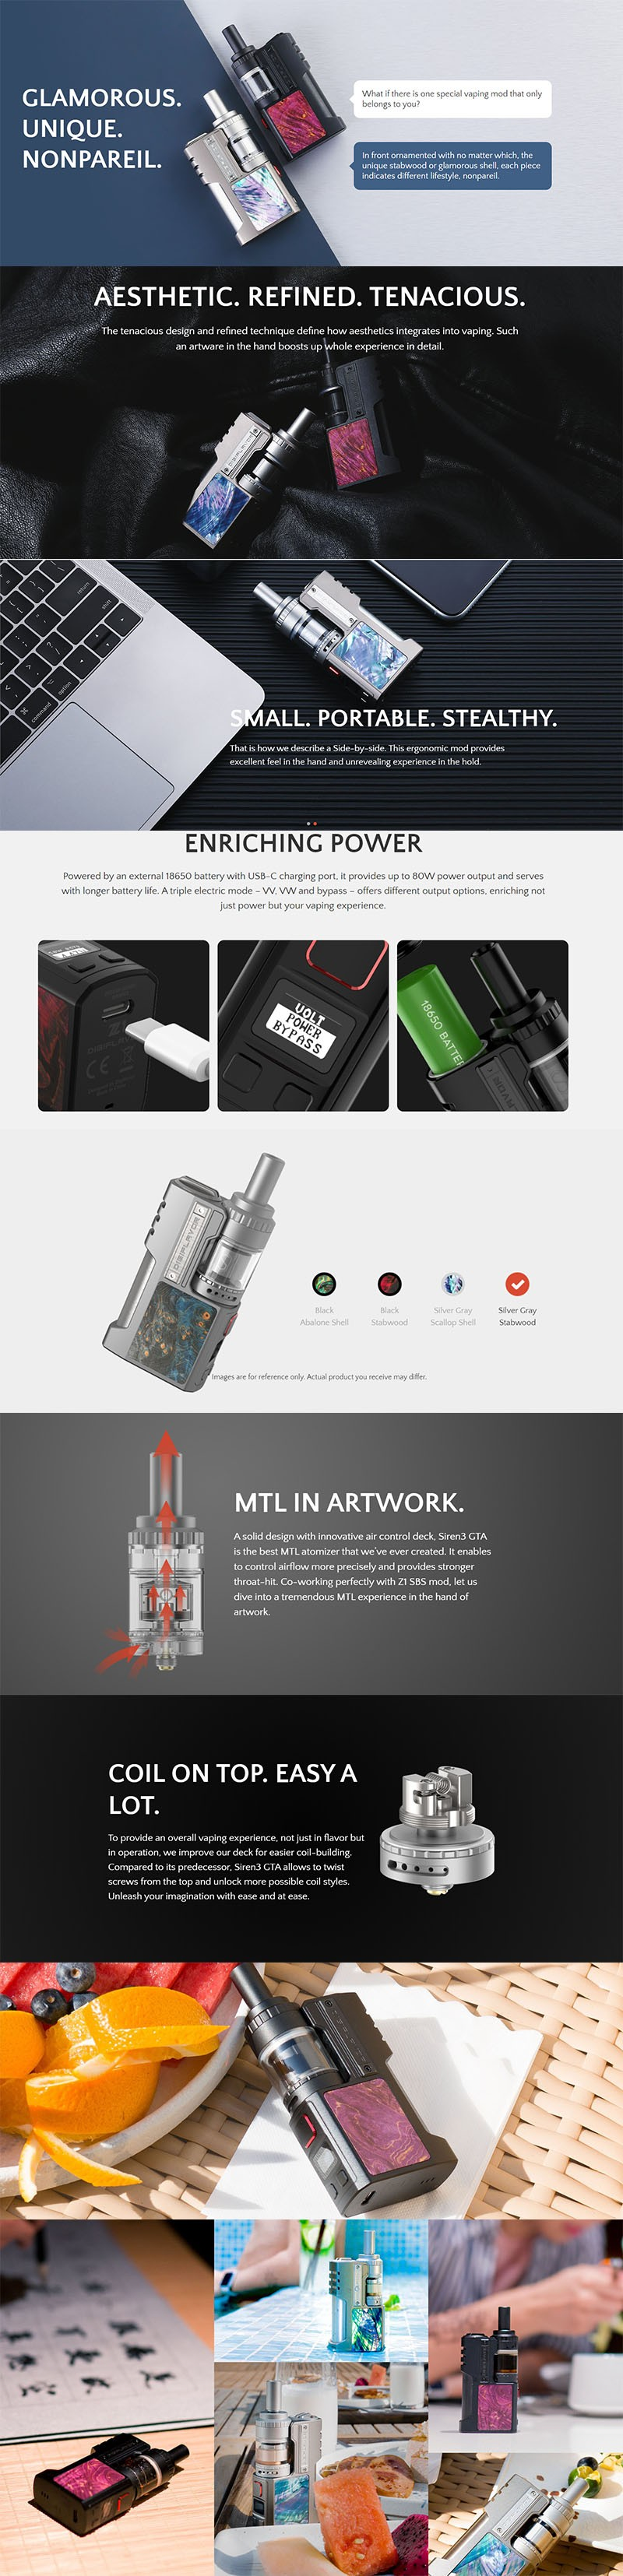 Authentic Digiflavor Z1 SBS Kit 80W VV VW Box Mod + Siren 3 GTA